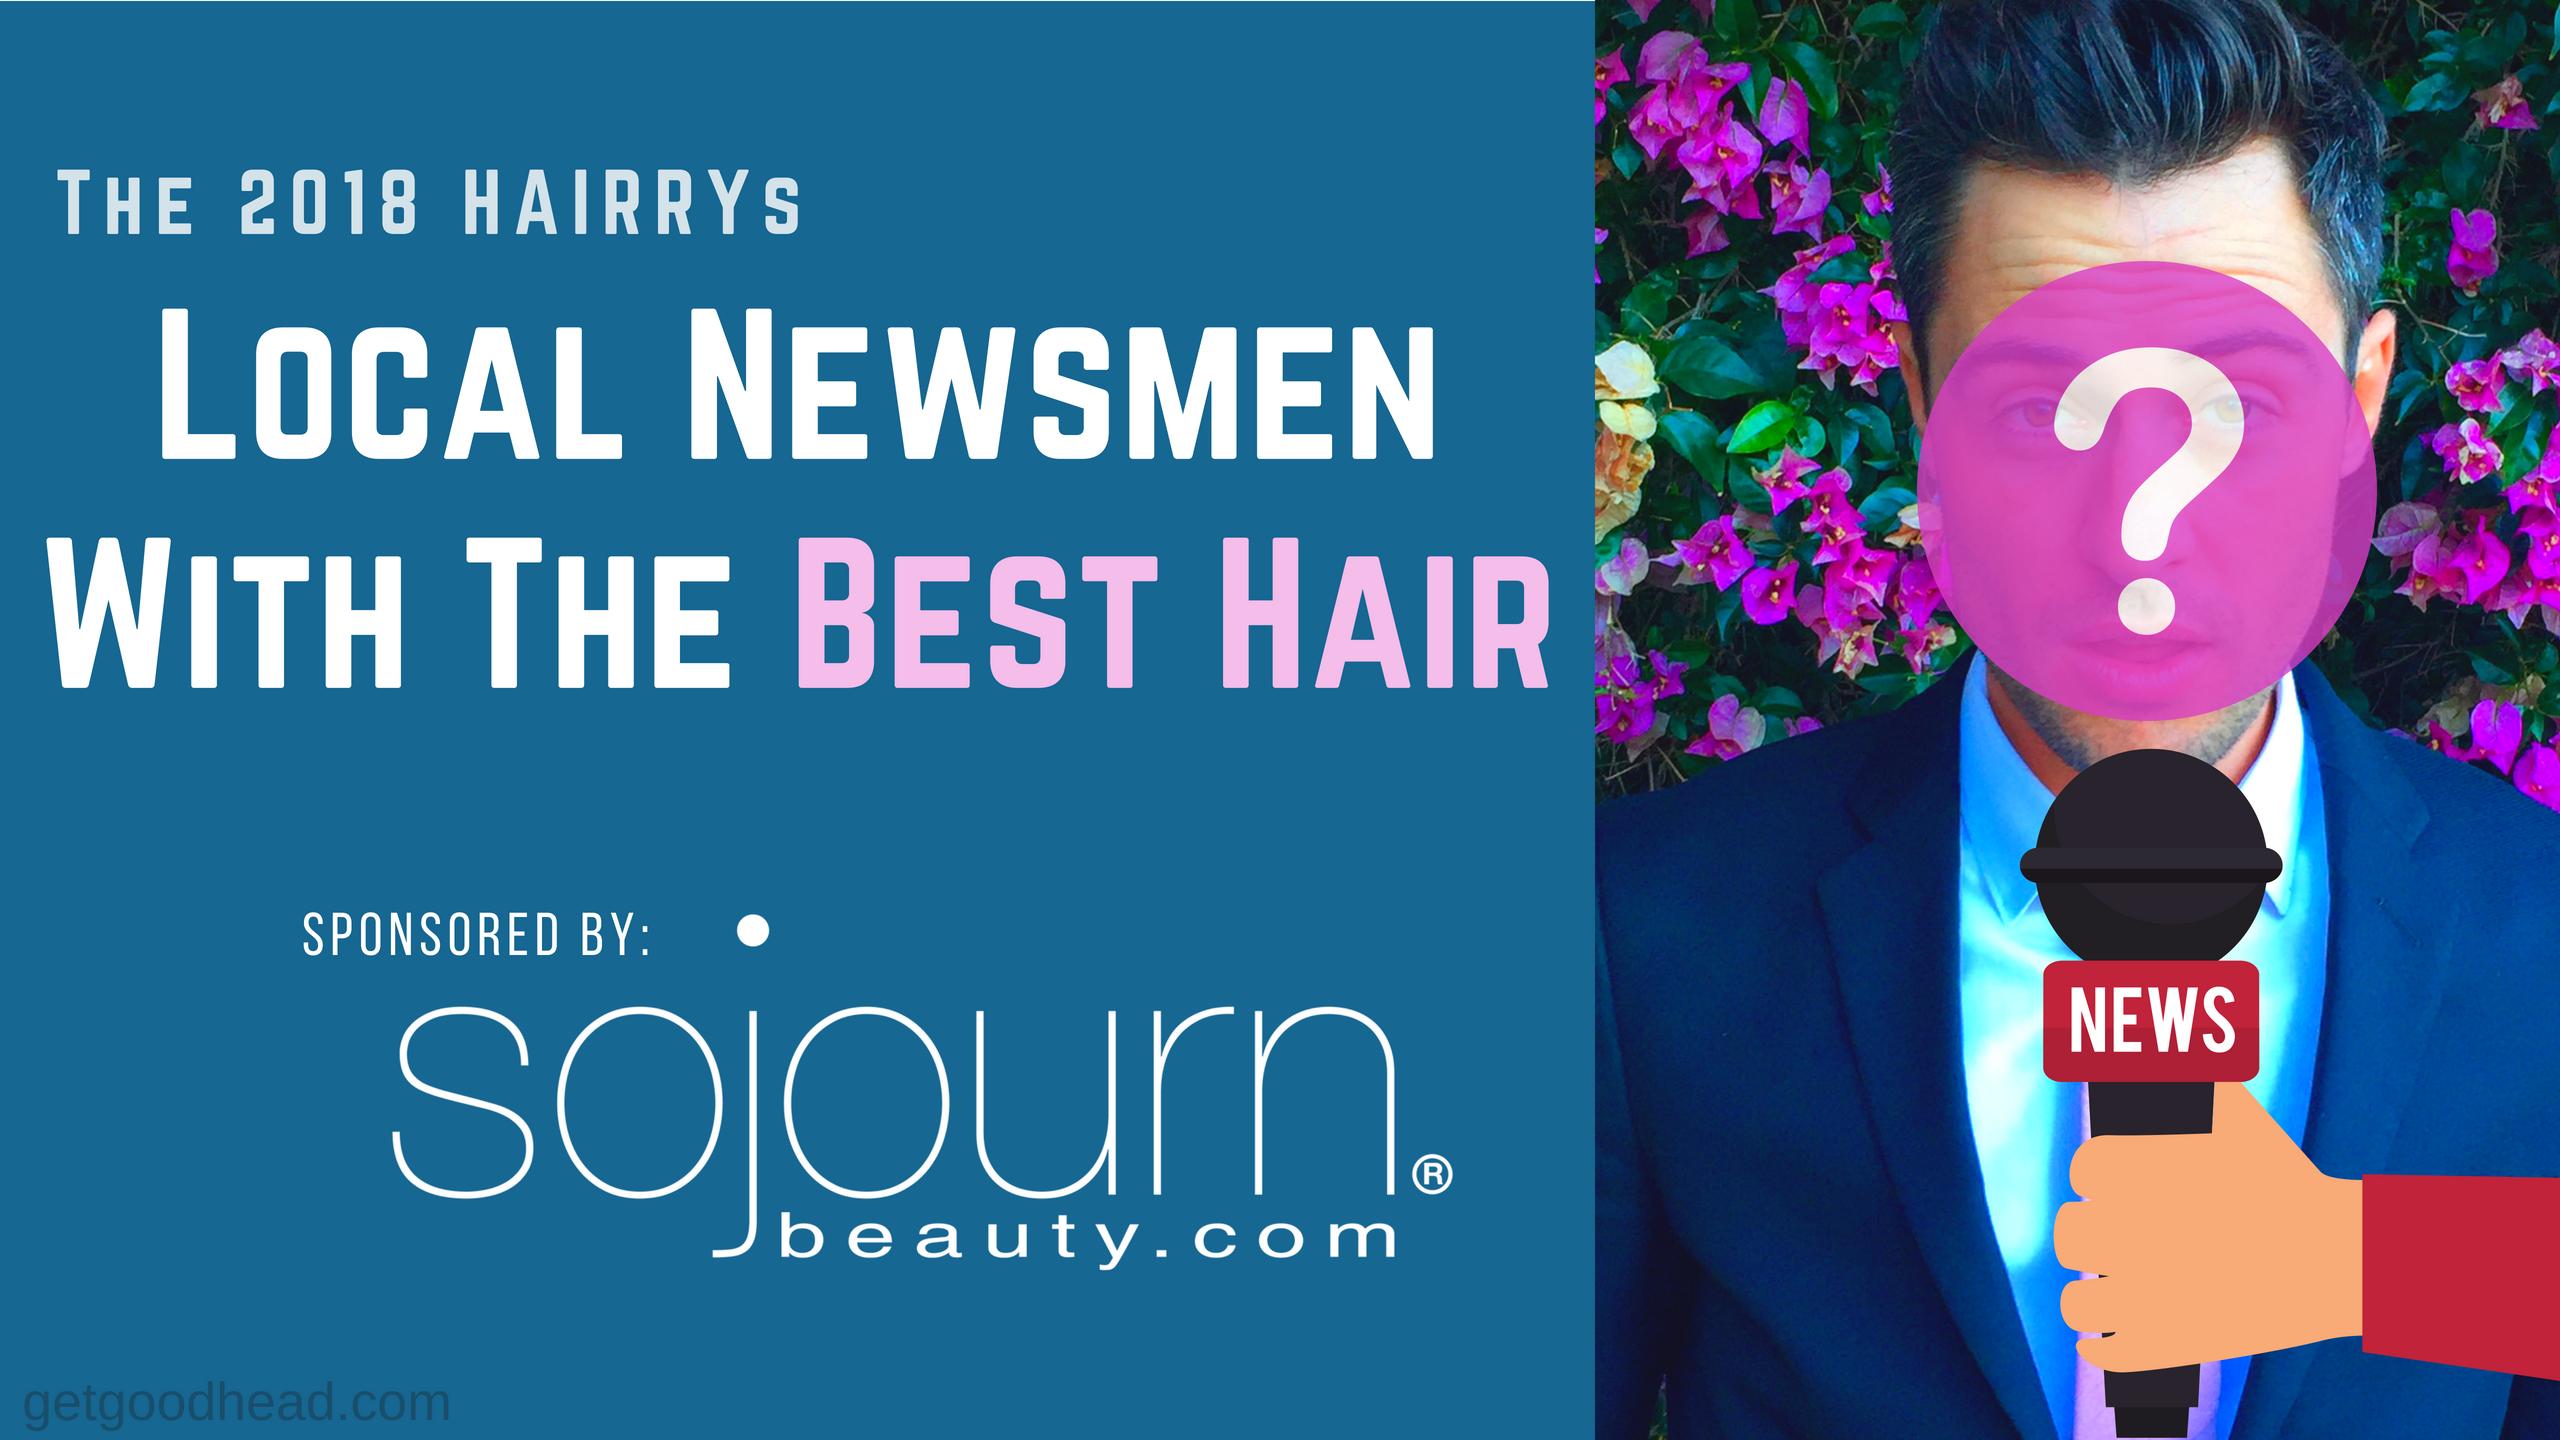 The HAIRRY Award's Local Newsmen Best Hair